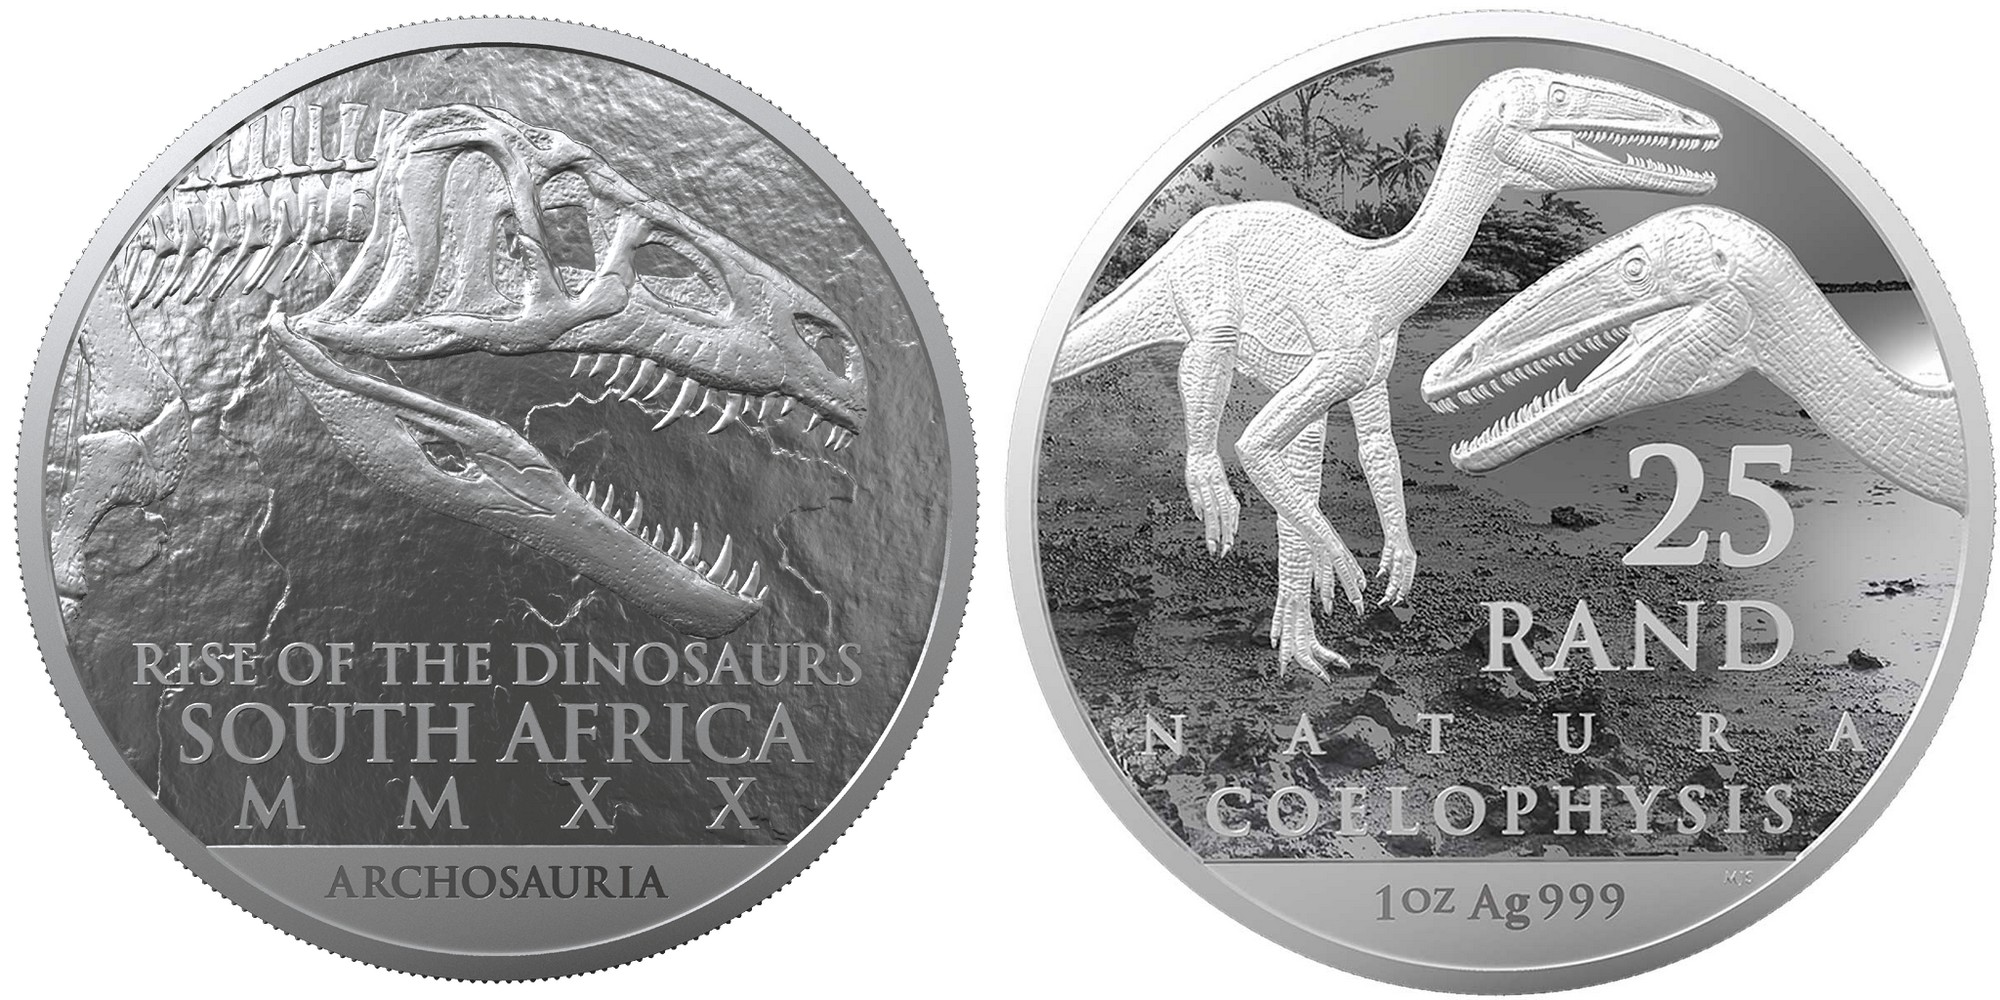 afsud-2020-dinosaures-coelophysis